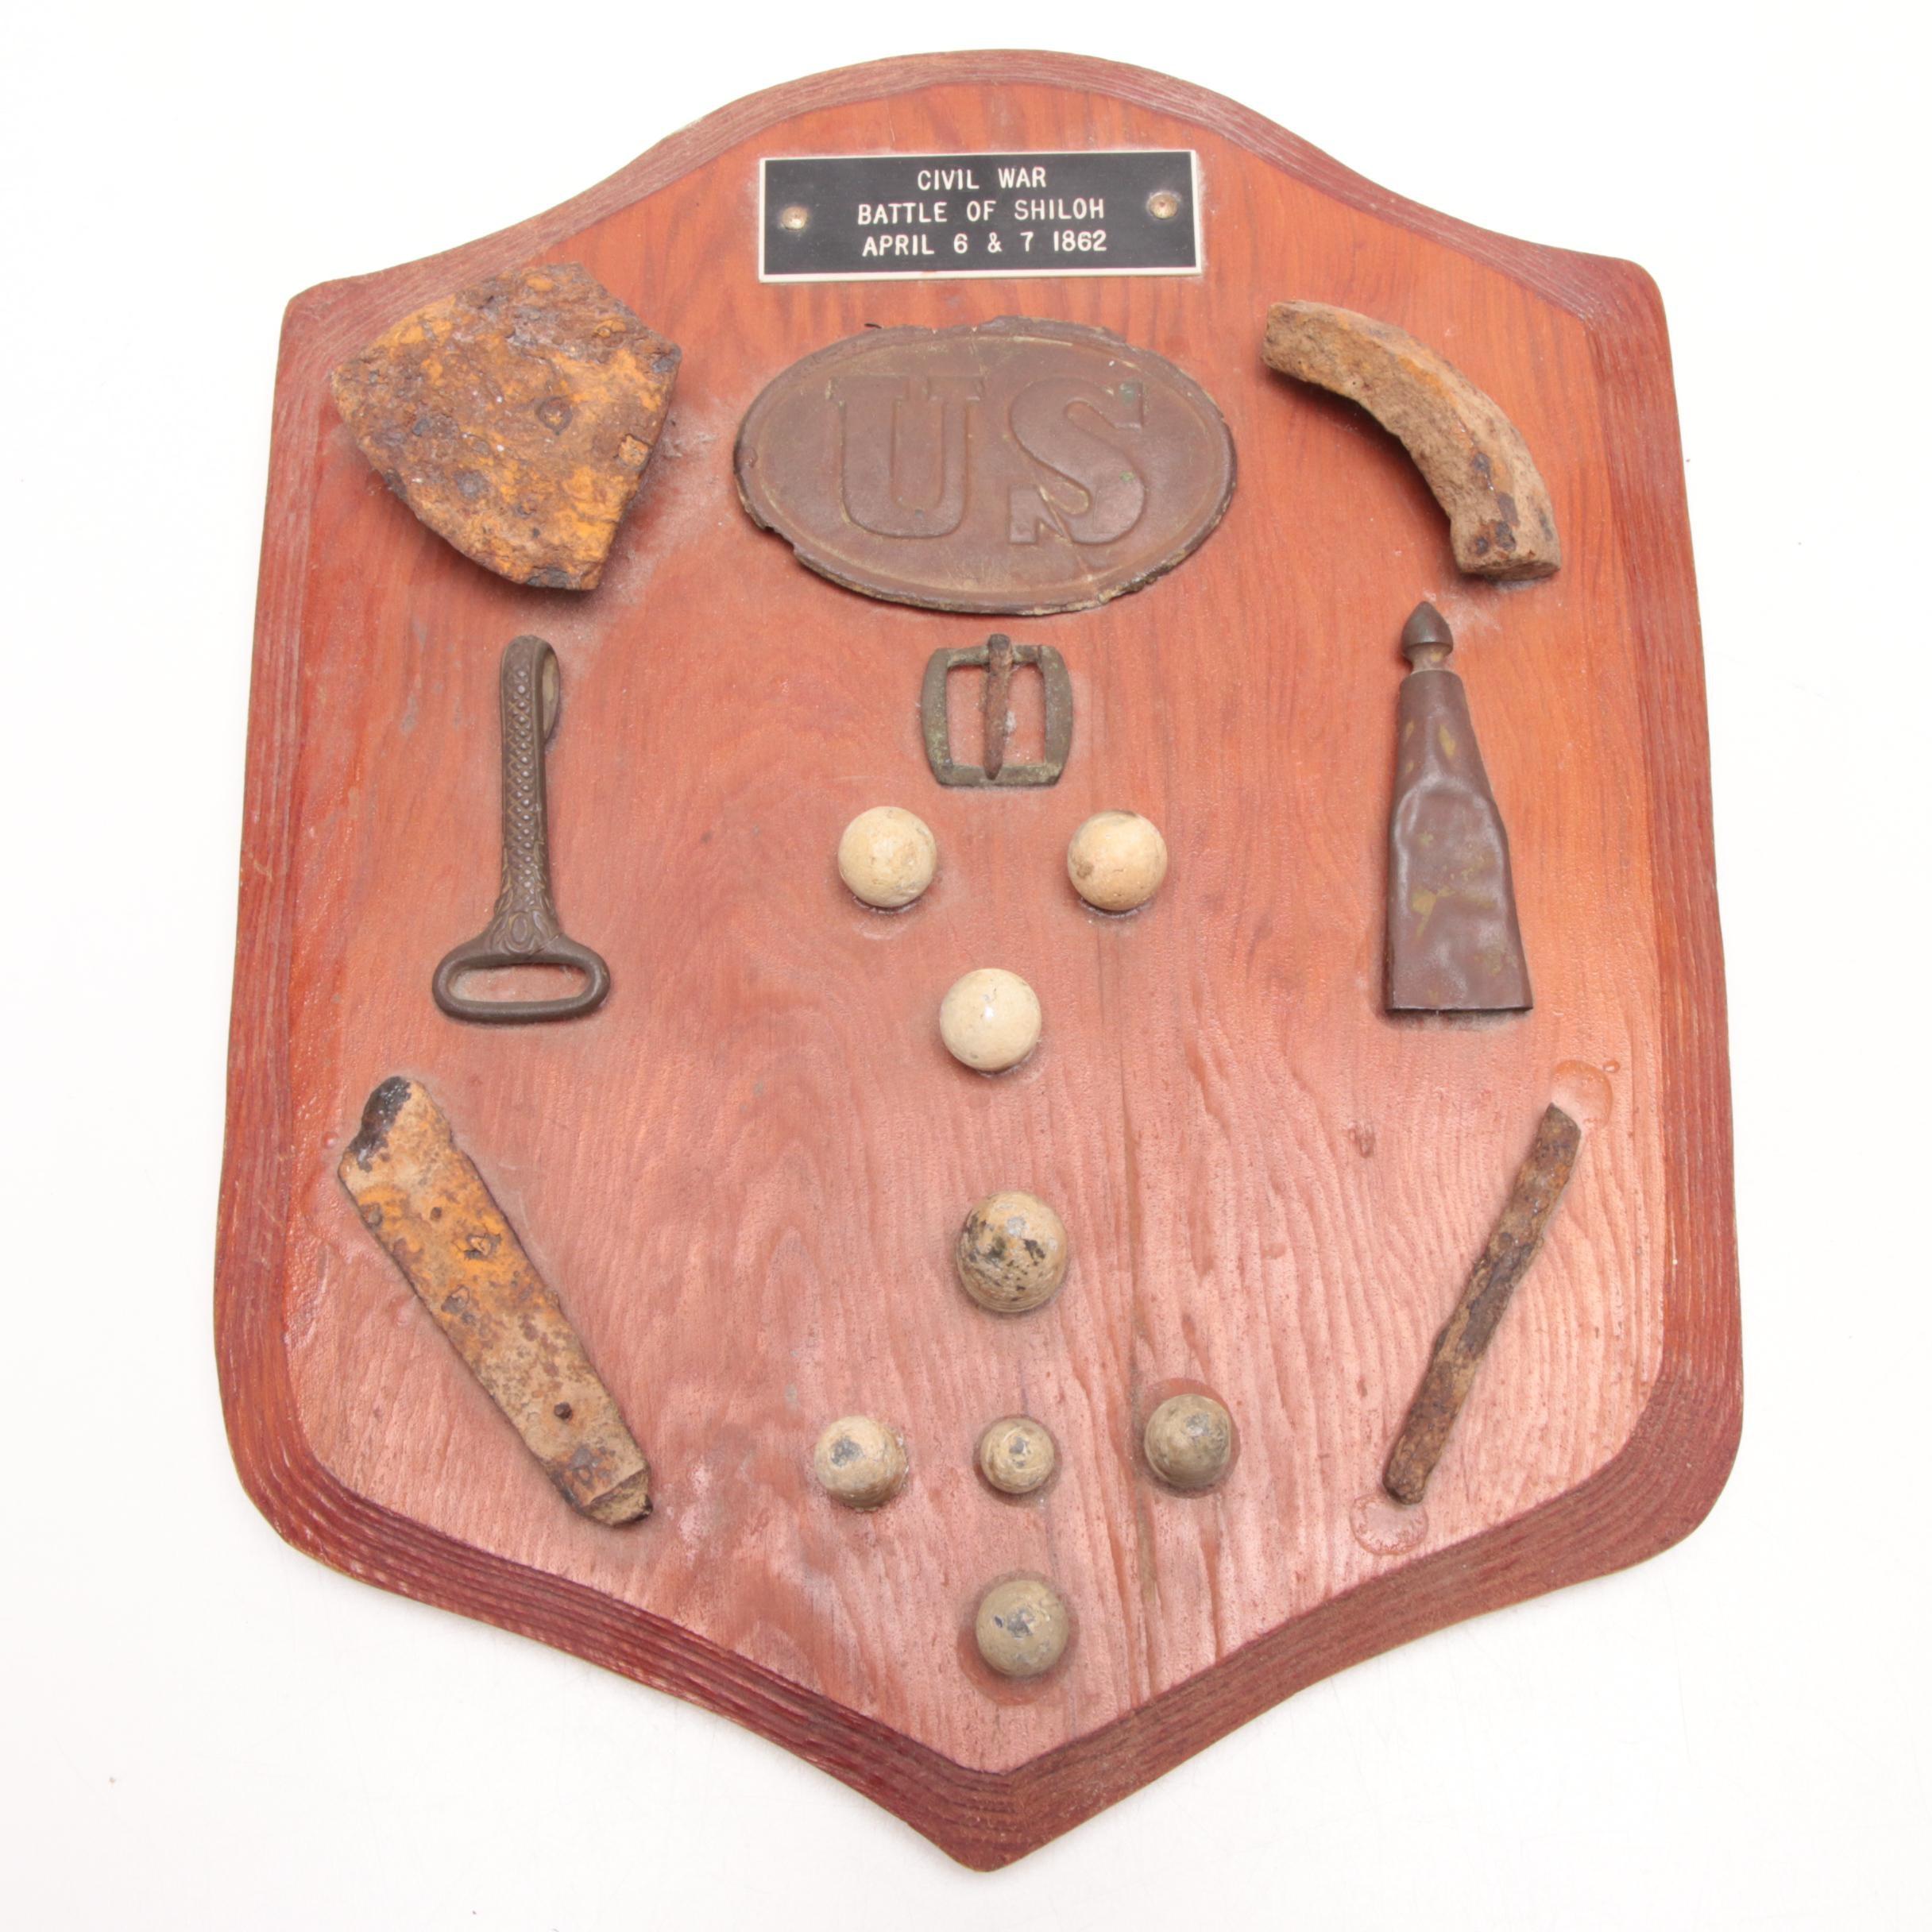 Dated 1862 Battle of Shiloh Civil War Battlefield Relics Shield Plaque